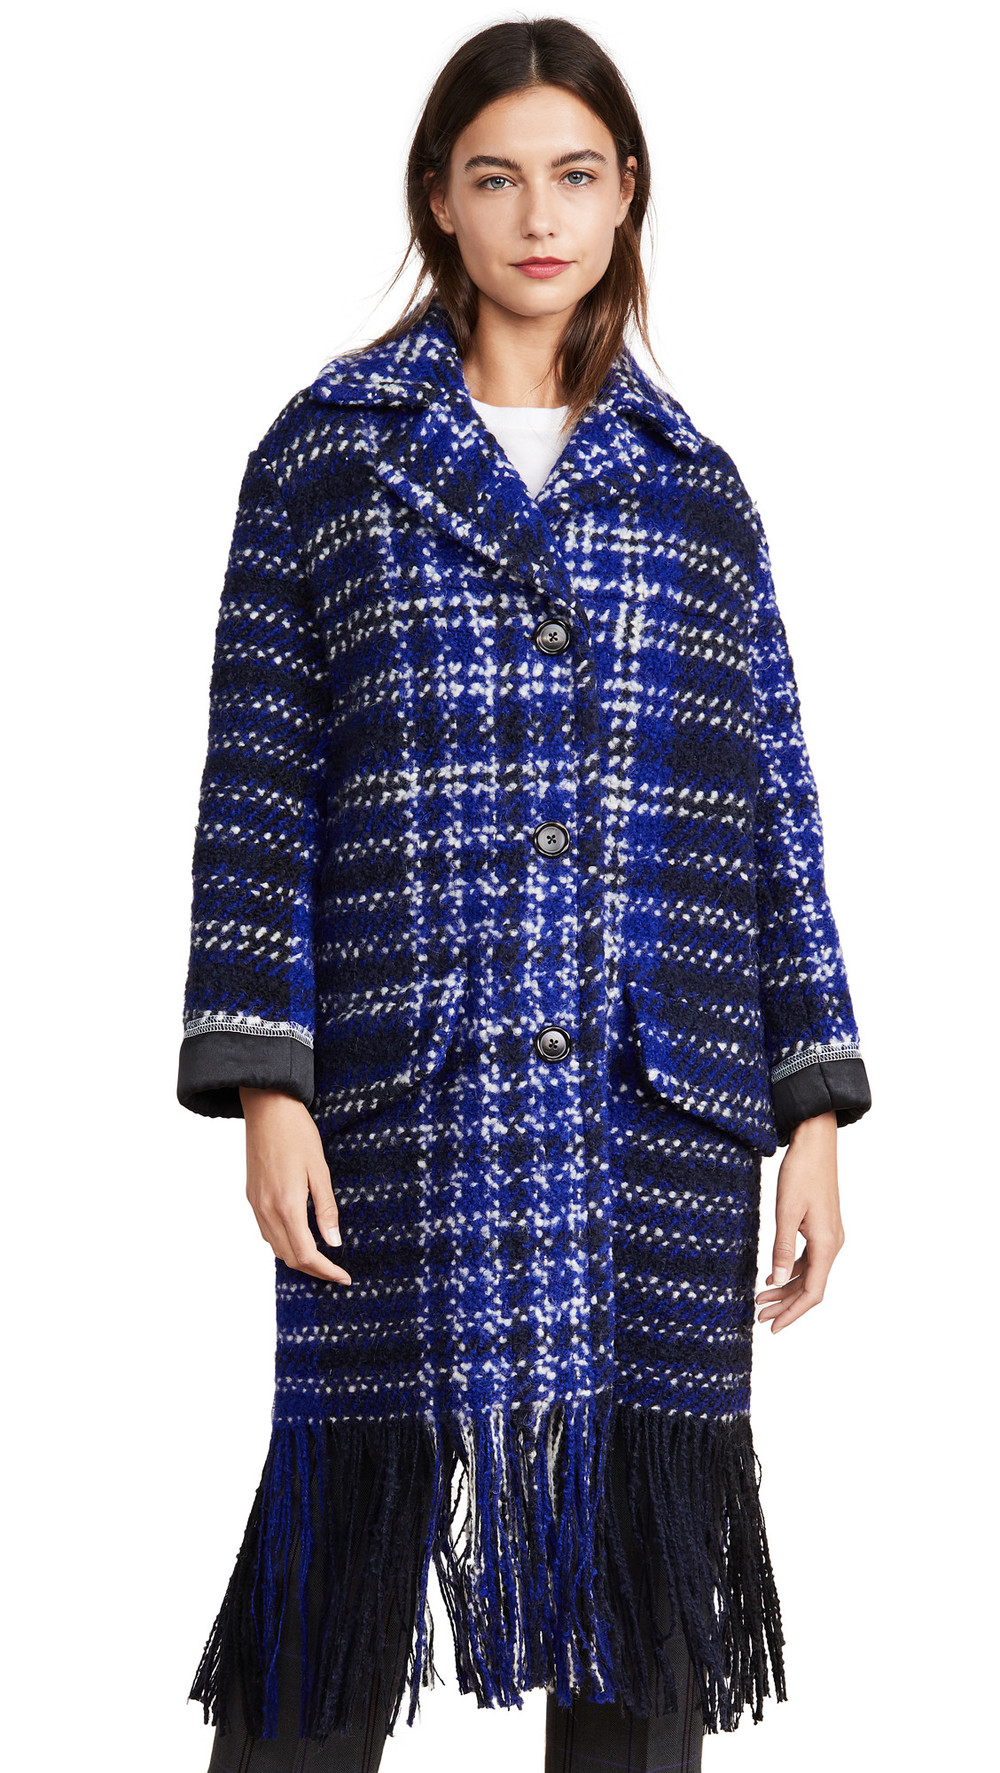 Marni Plaid Coat in blue